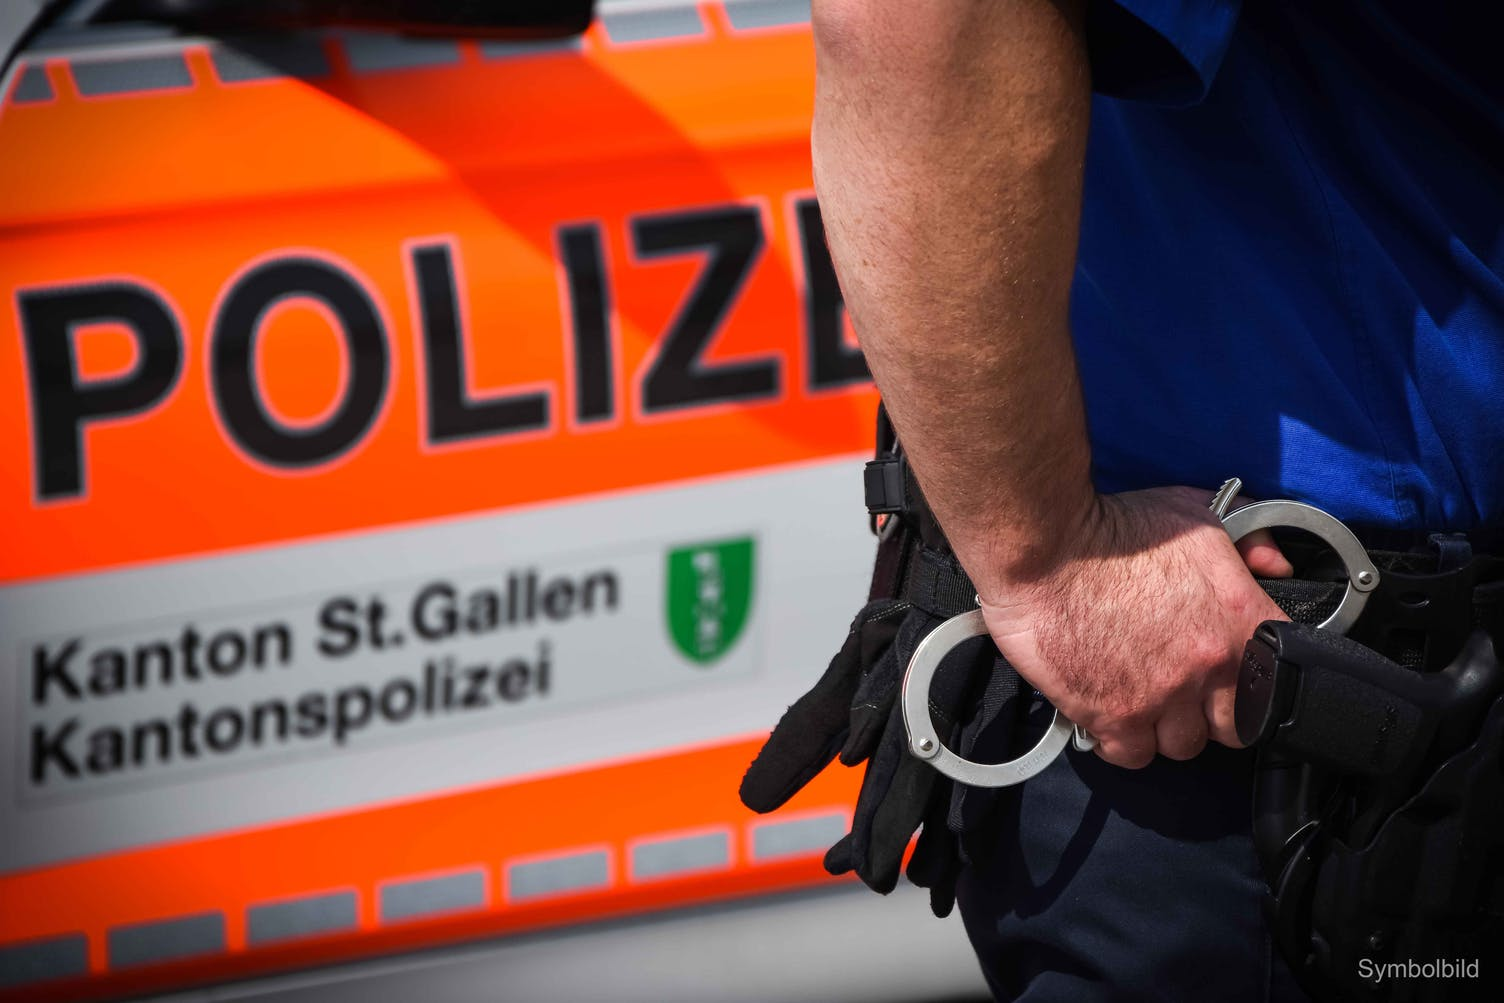 Polizei Festnahme